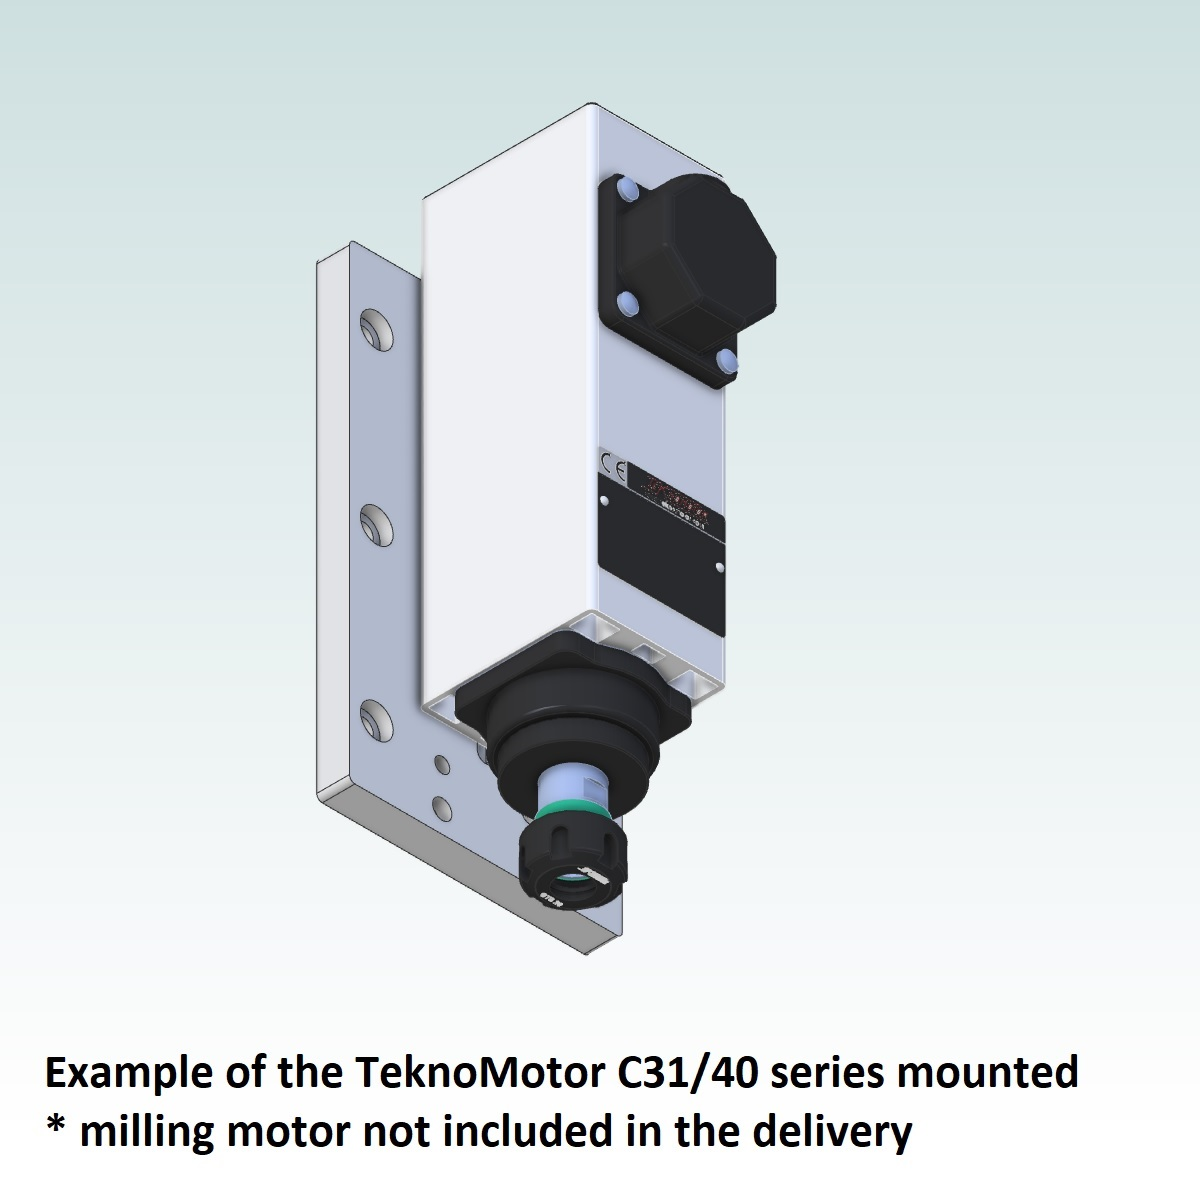 42714 teknomotor mountingplate icp4030 example with teknomotor c3140 mounted